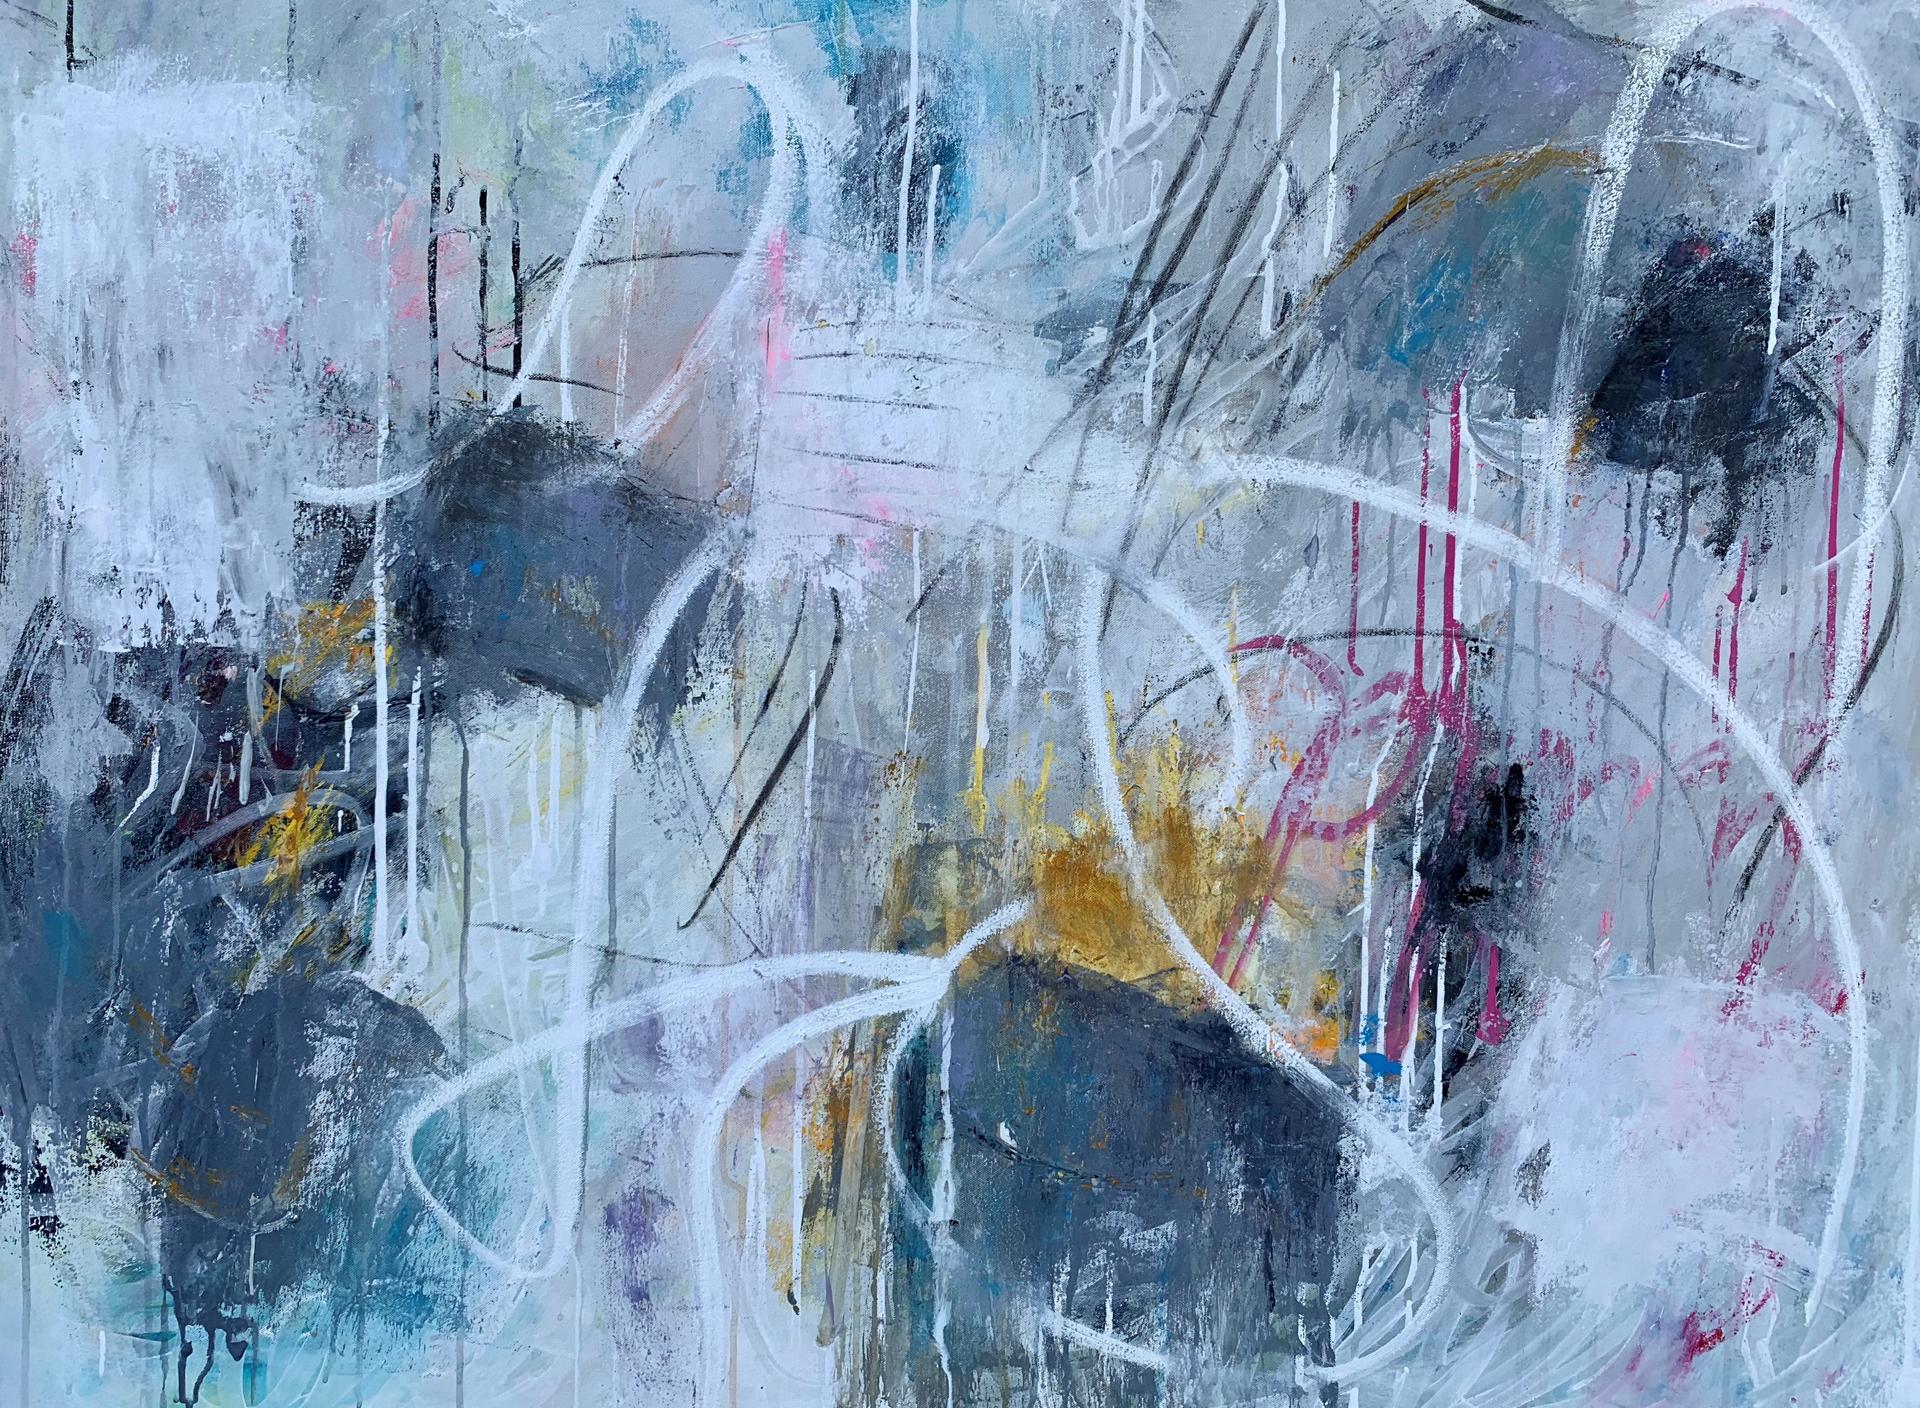 Wild Child by Alicia Gitlitz